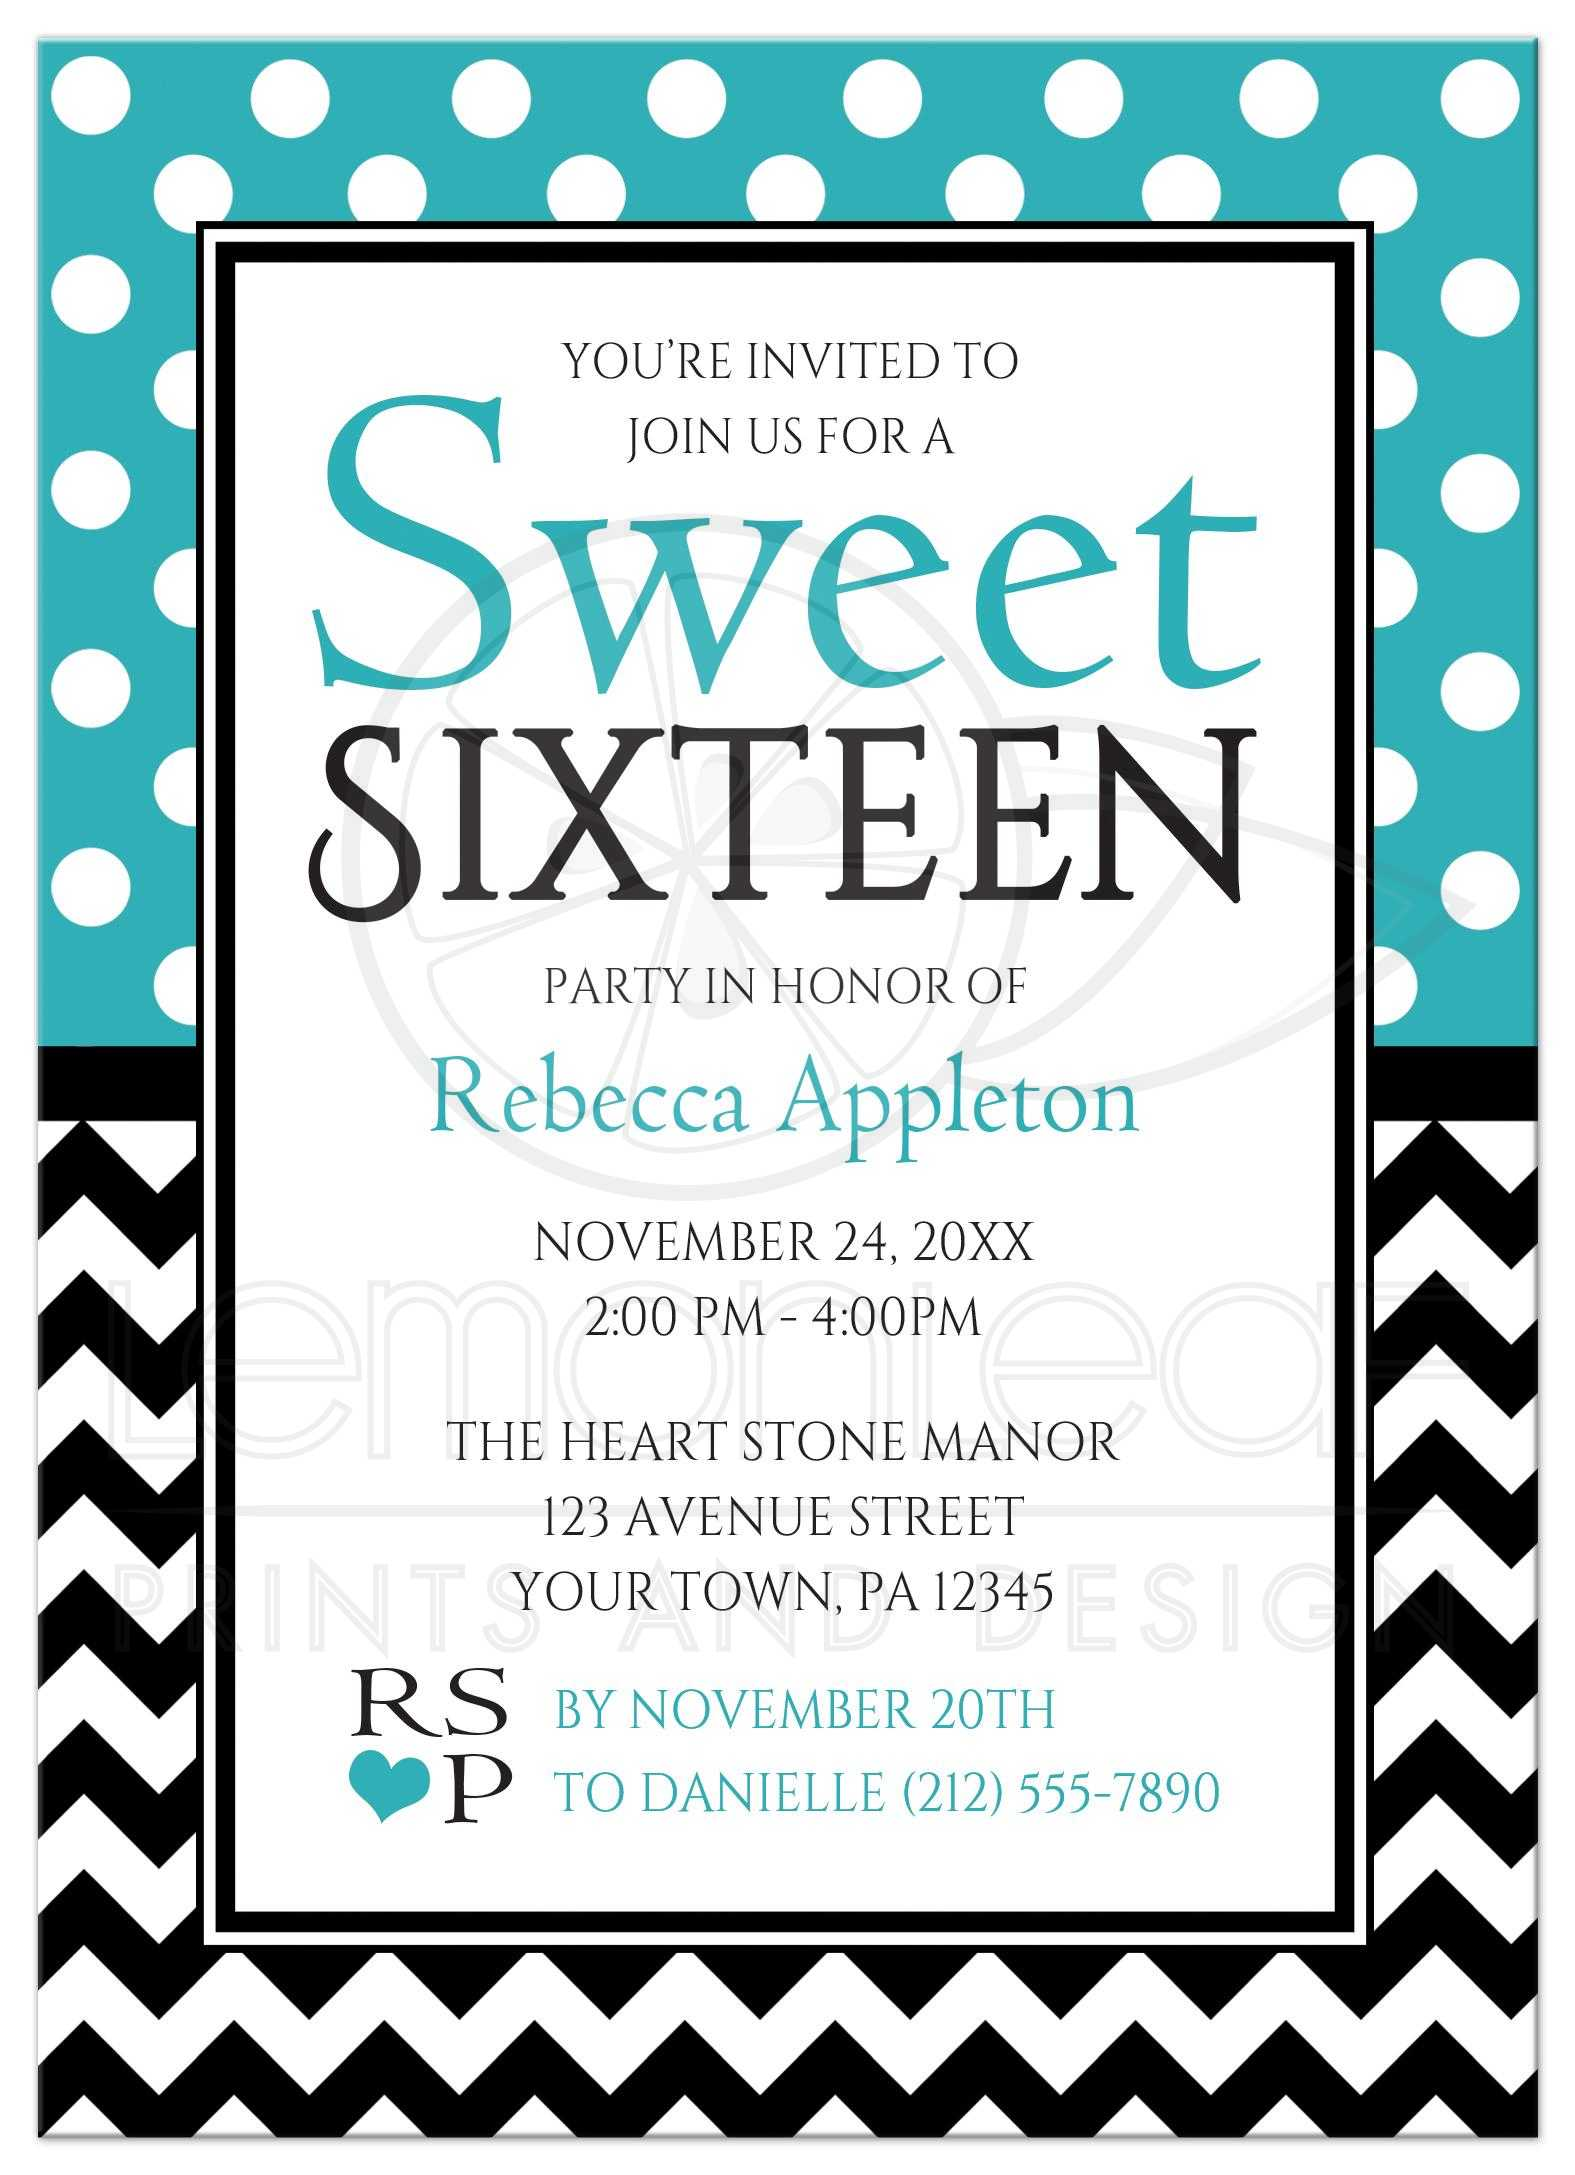 sweet 16 invitations polka dot turquoise chevron